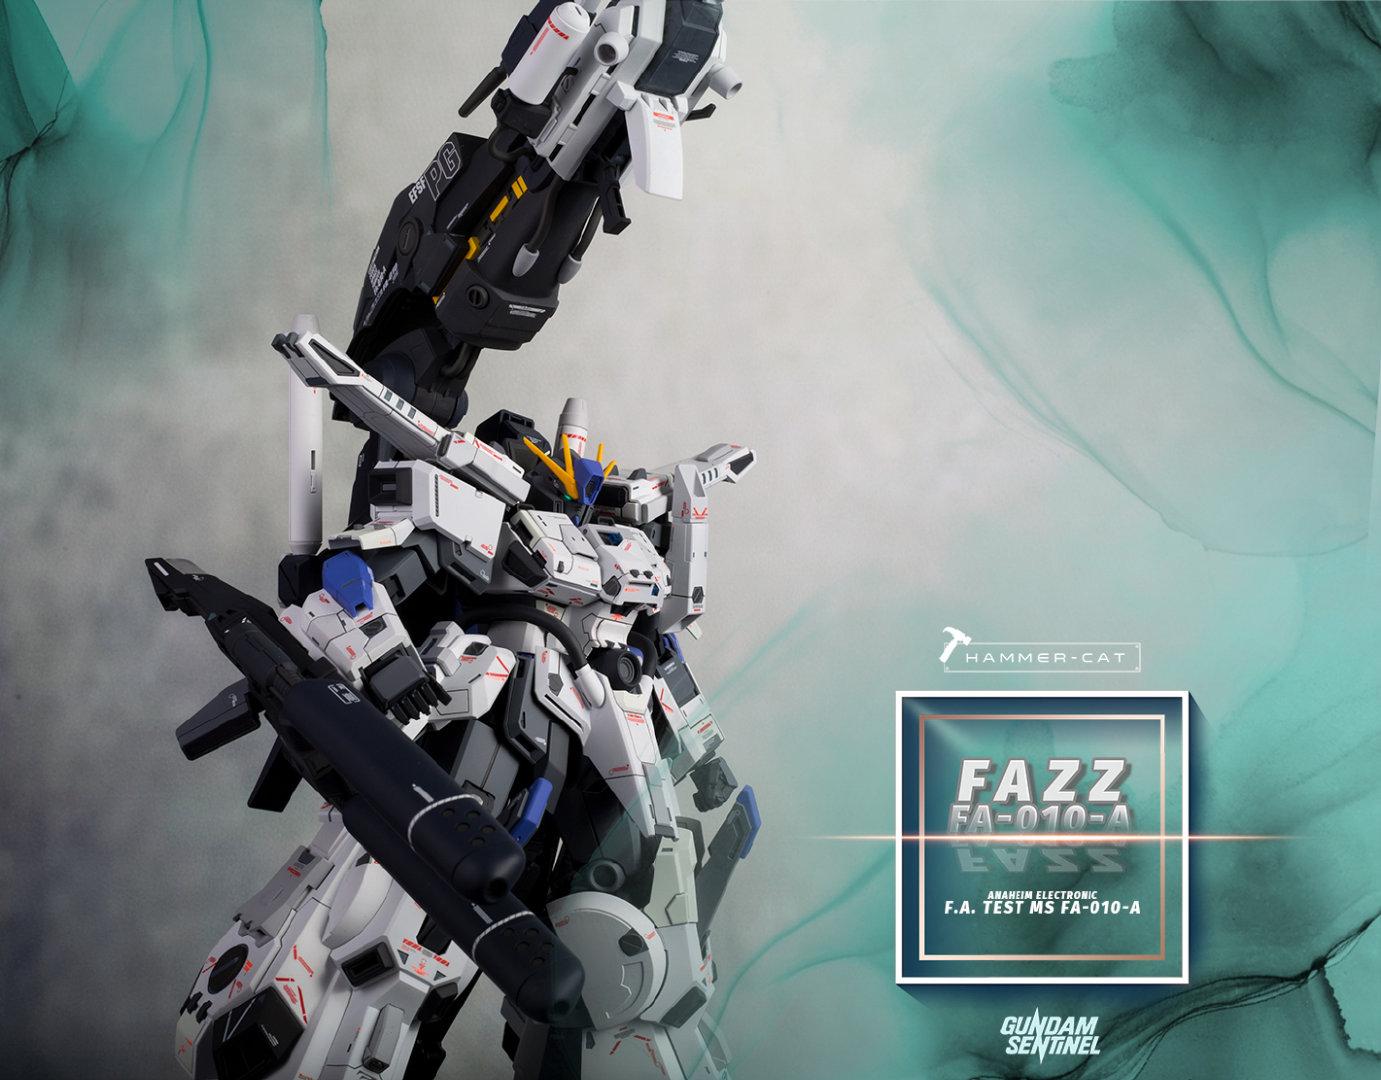 G748_MG_FAZZ_info_010.jpg